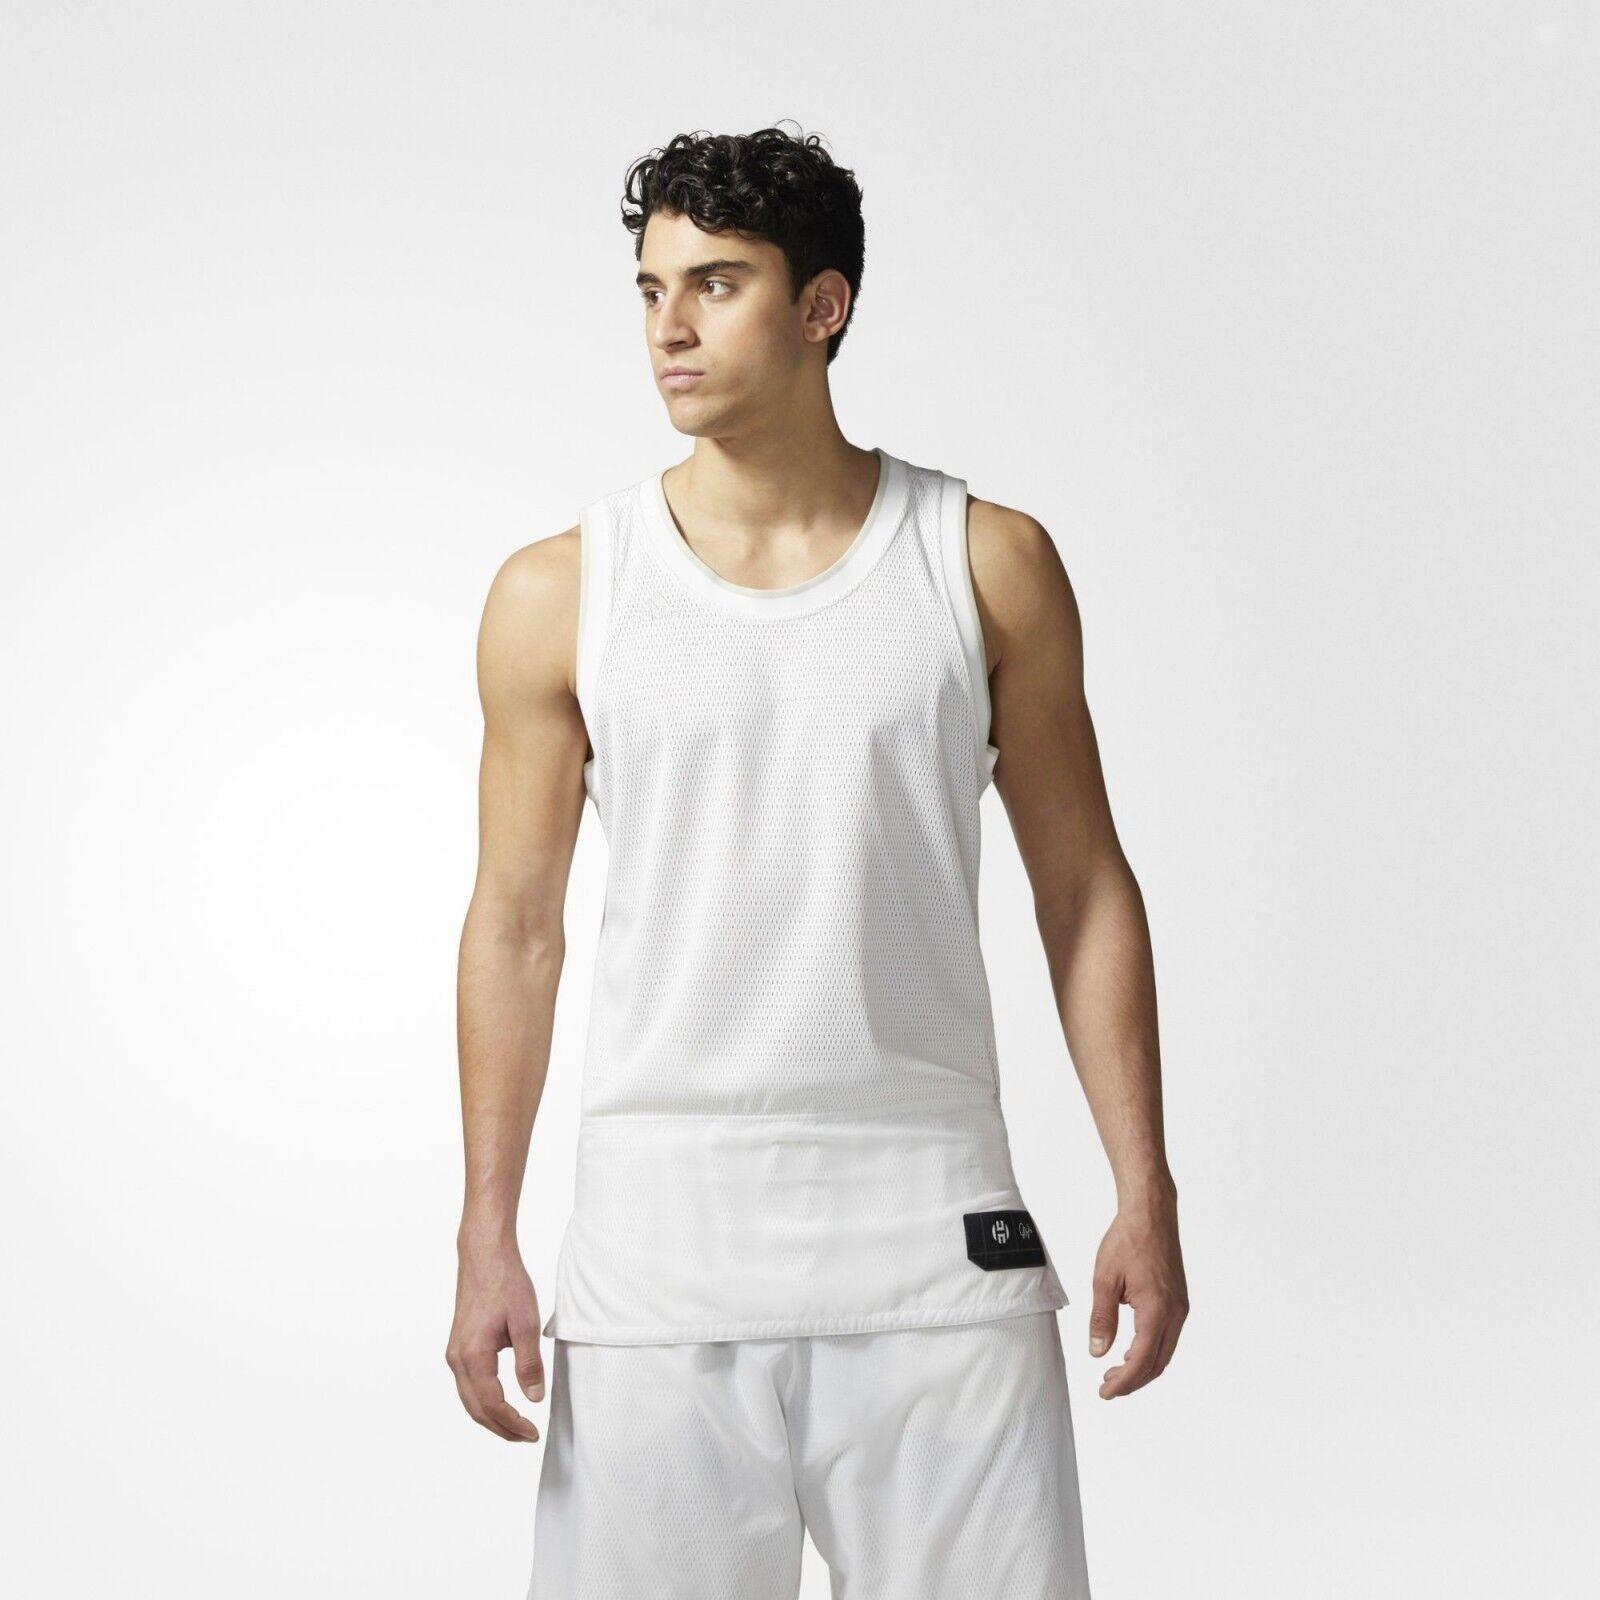 Adidas Mens James Harden Volume 1 Playmaker Basketball Jersey  Save 40% Large